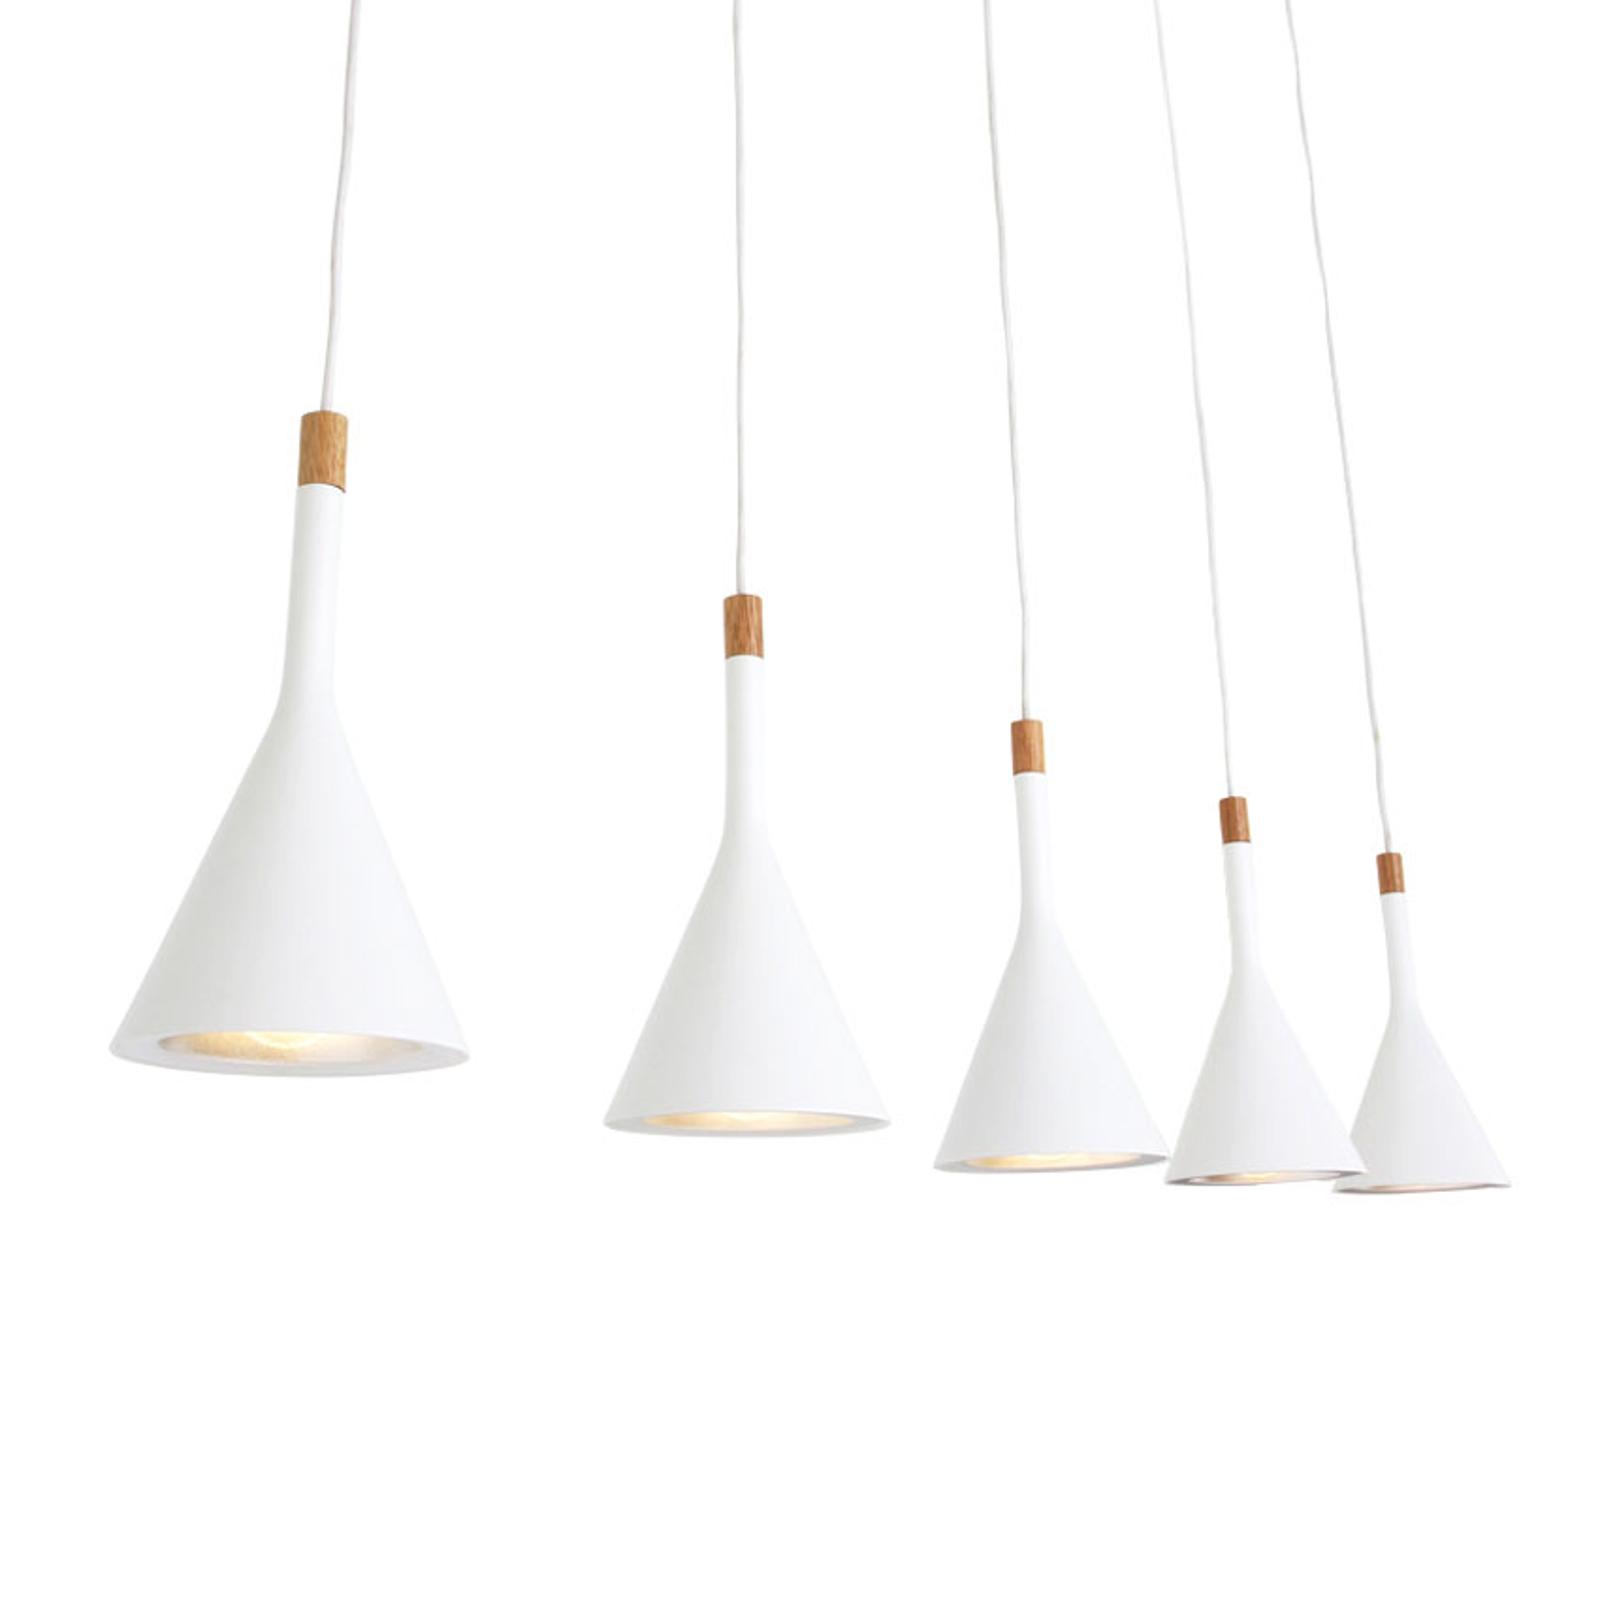 Lampa wisząca Cornucopia, biała, 5-punktowa